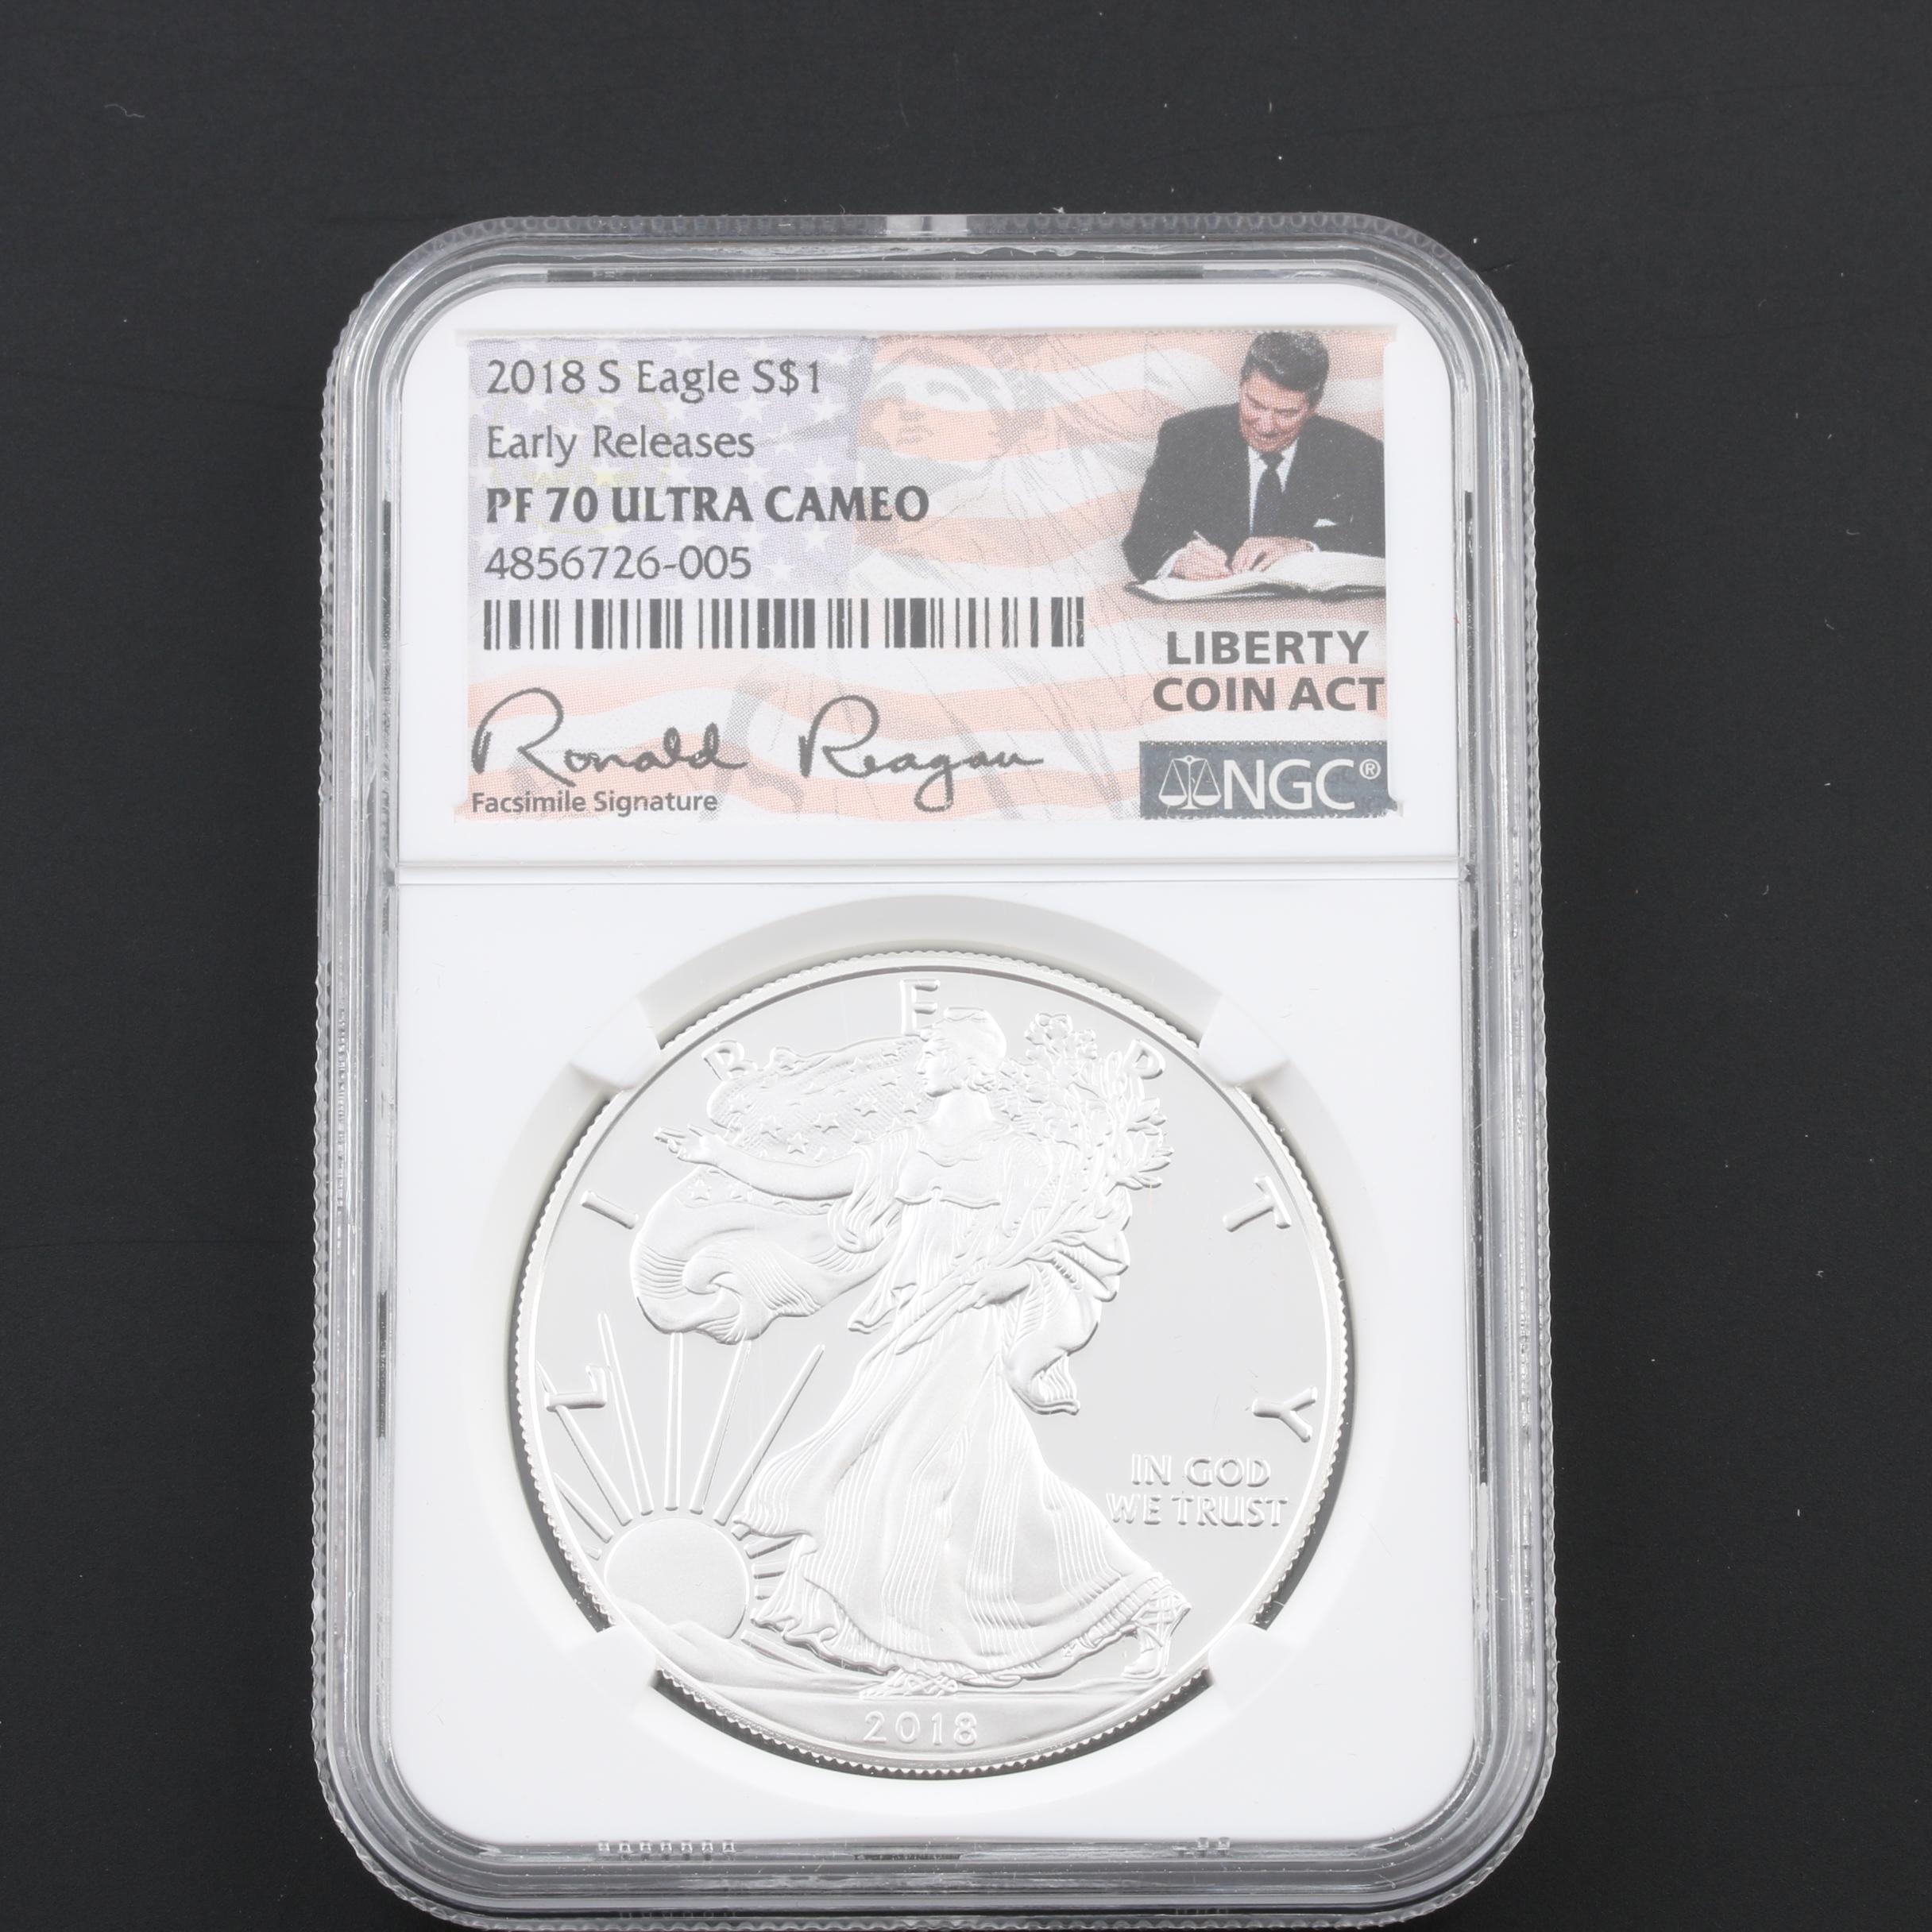 NGC Graded PF70 Ultra Cameo 2018-S $1 U.S. Silver Eagle